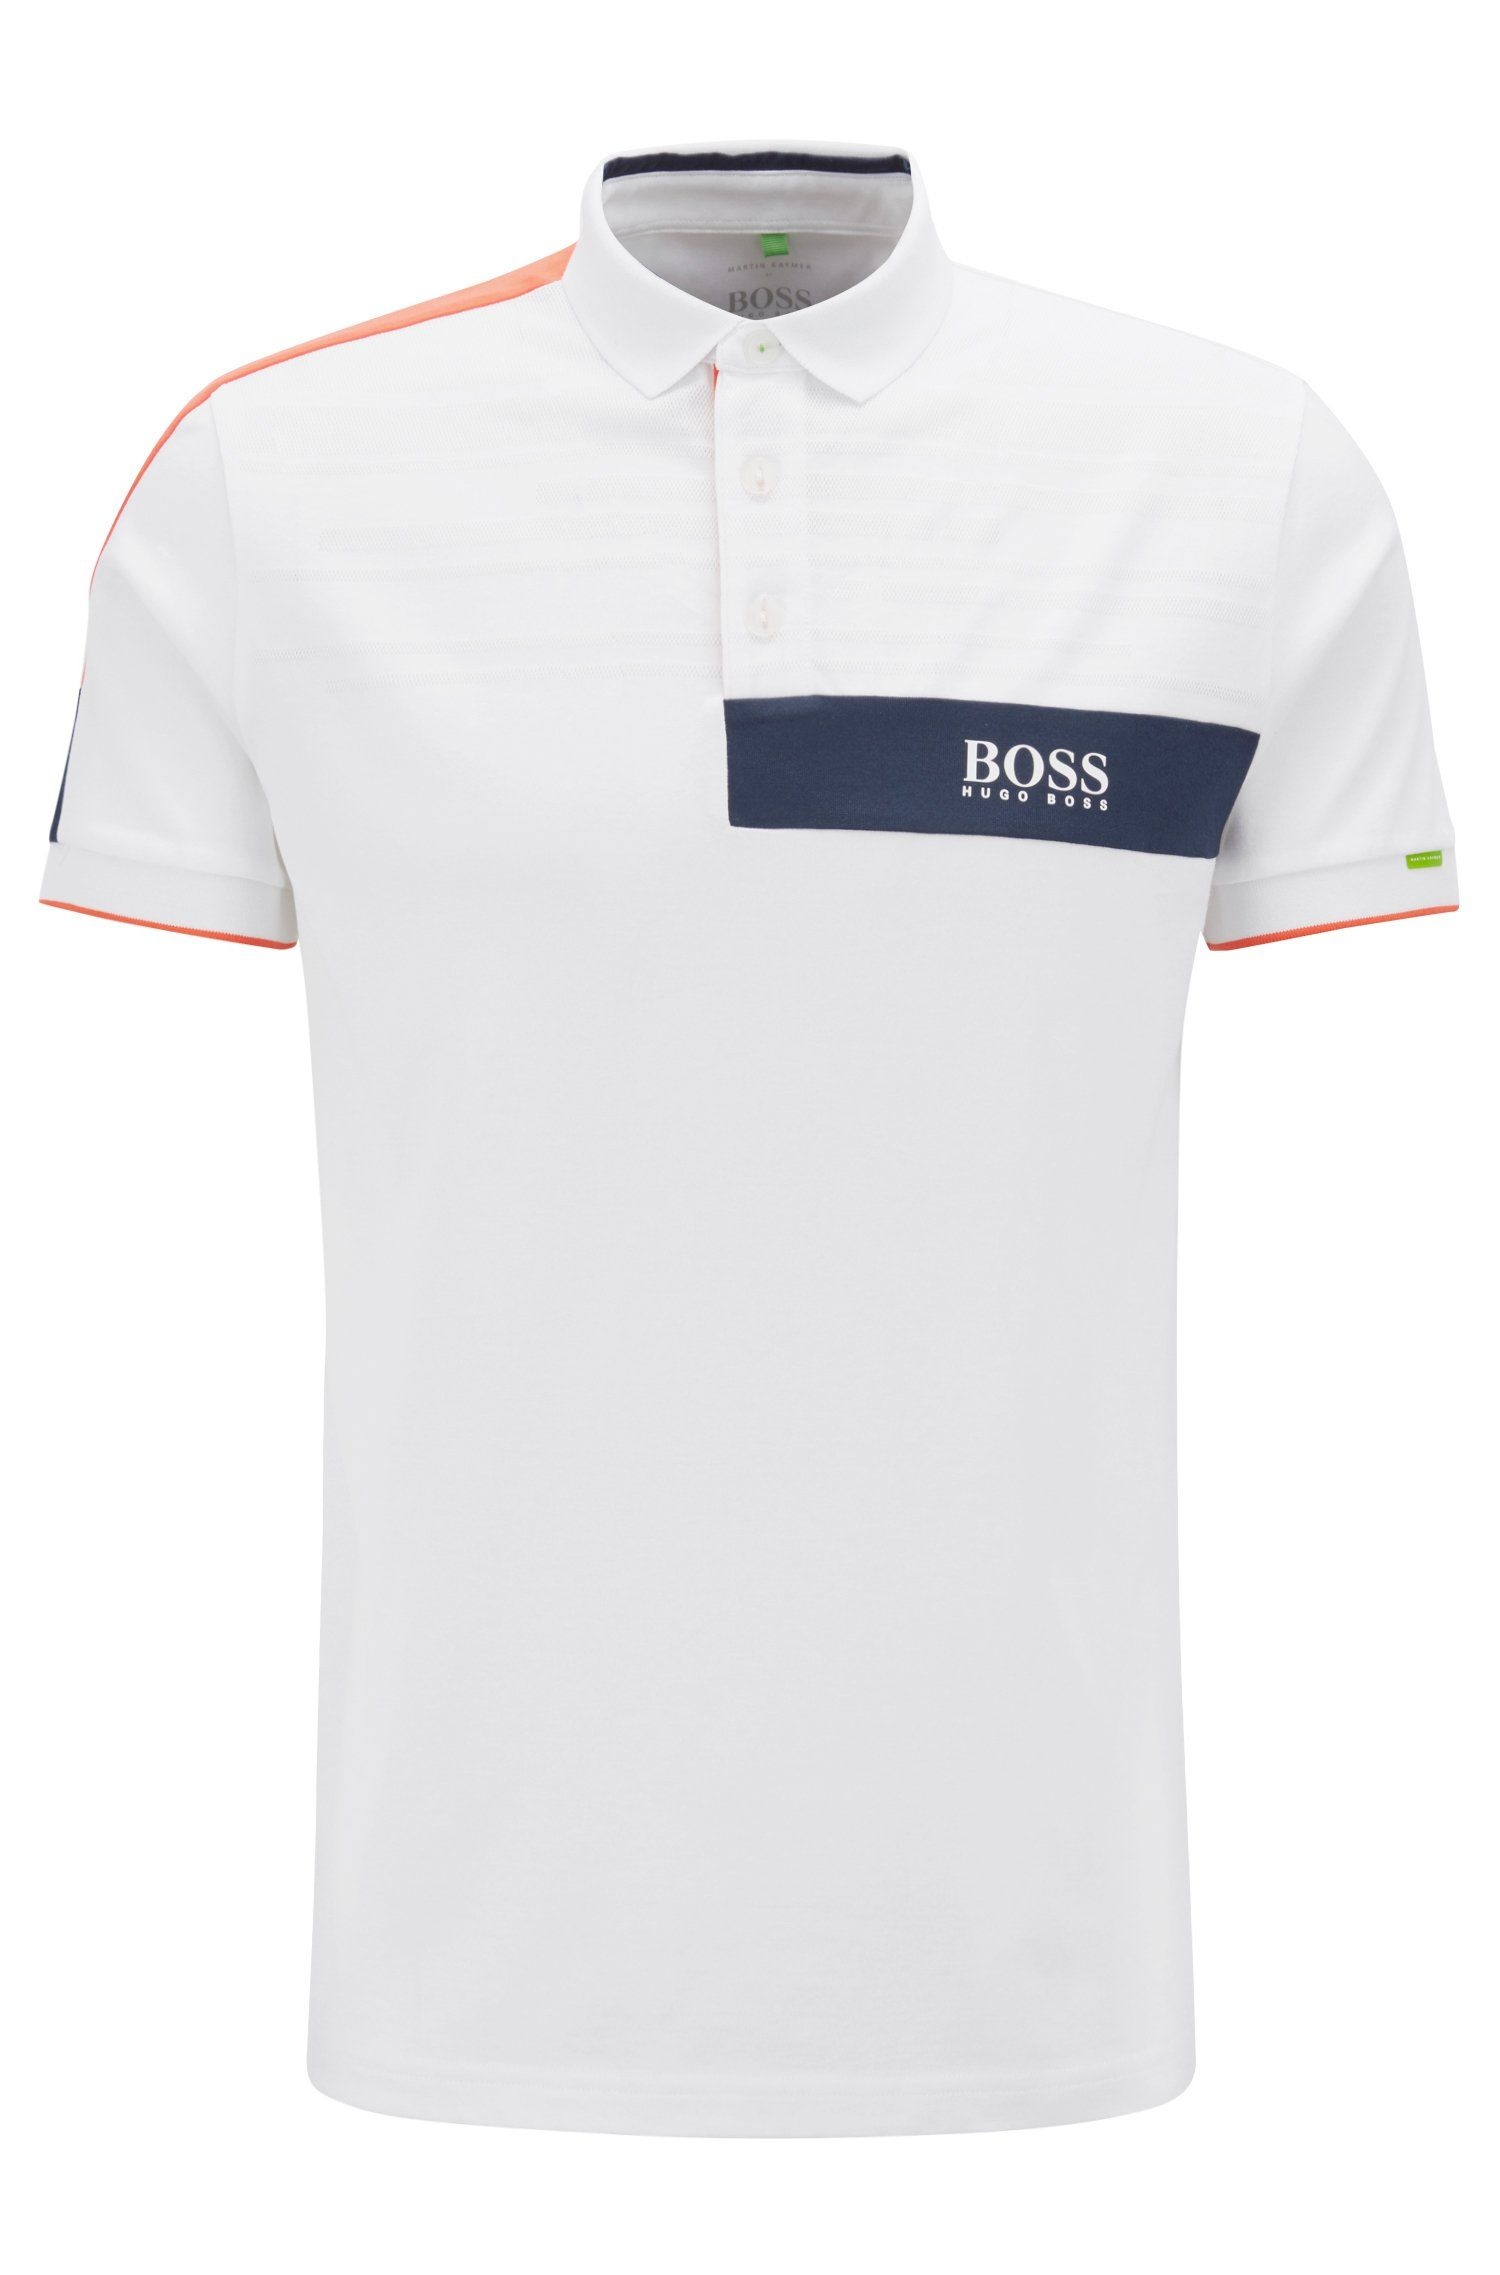 17++ Bespoke golf shirts ideas in 2021